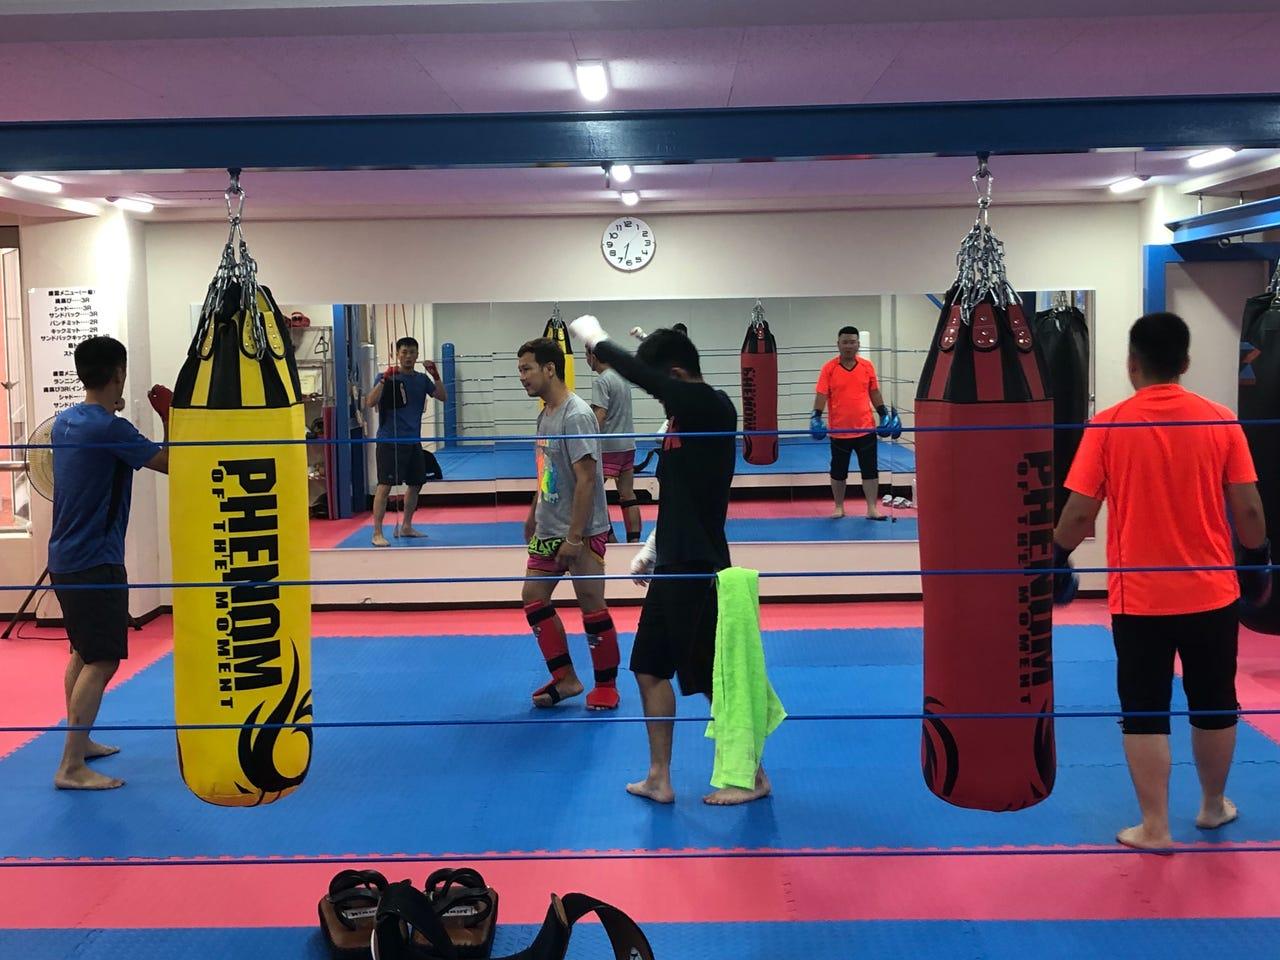 Siriluck Japan Muaythai Gym(シリラックジャパンムエタイジム) の画像